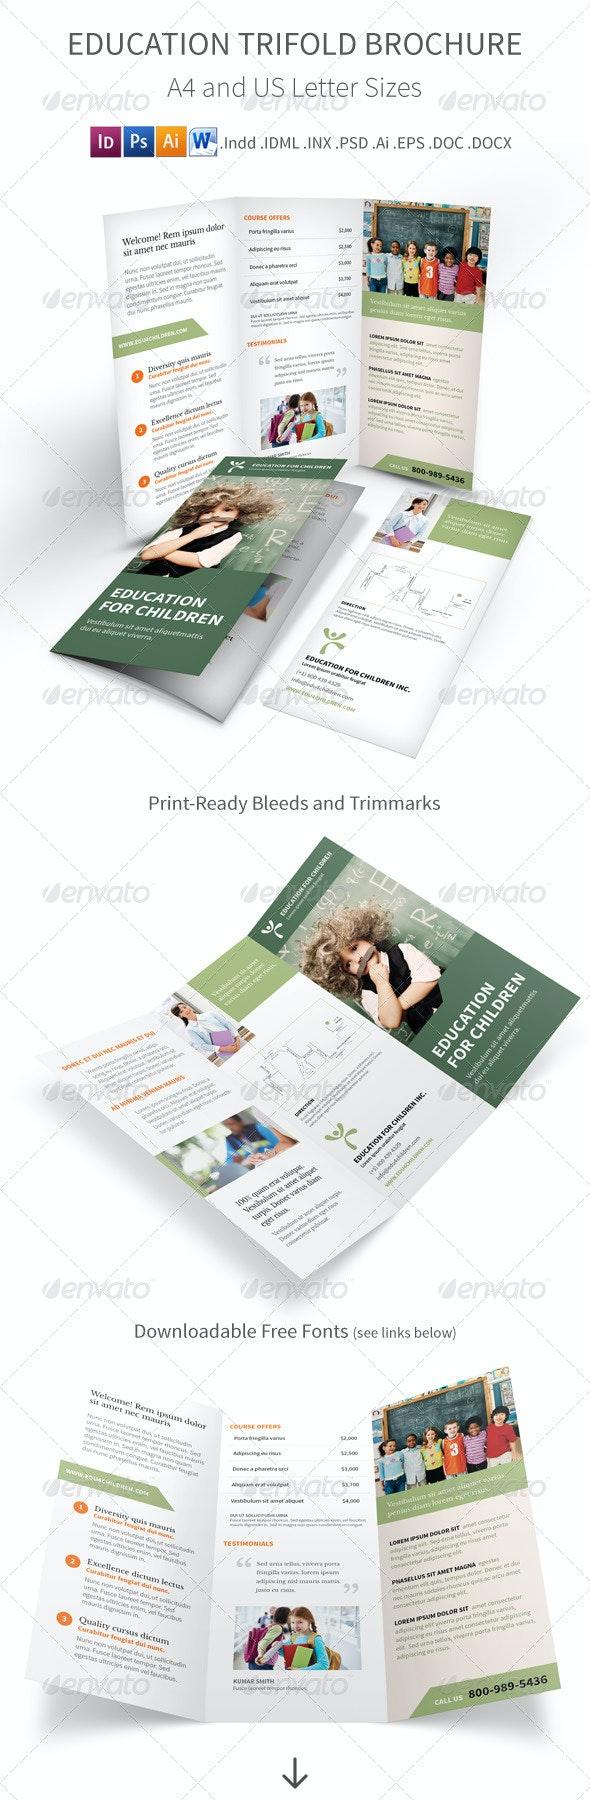 Education Trifold Brochure - Informational Brochures